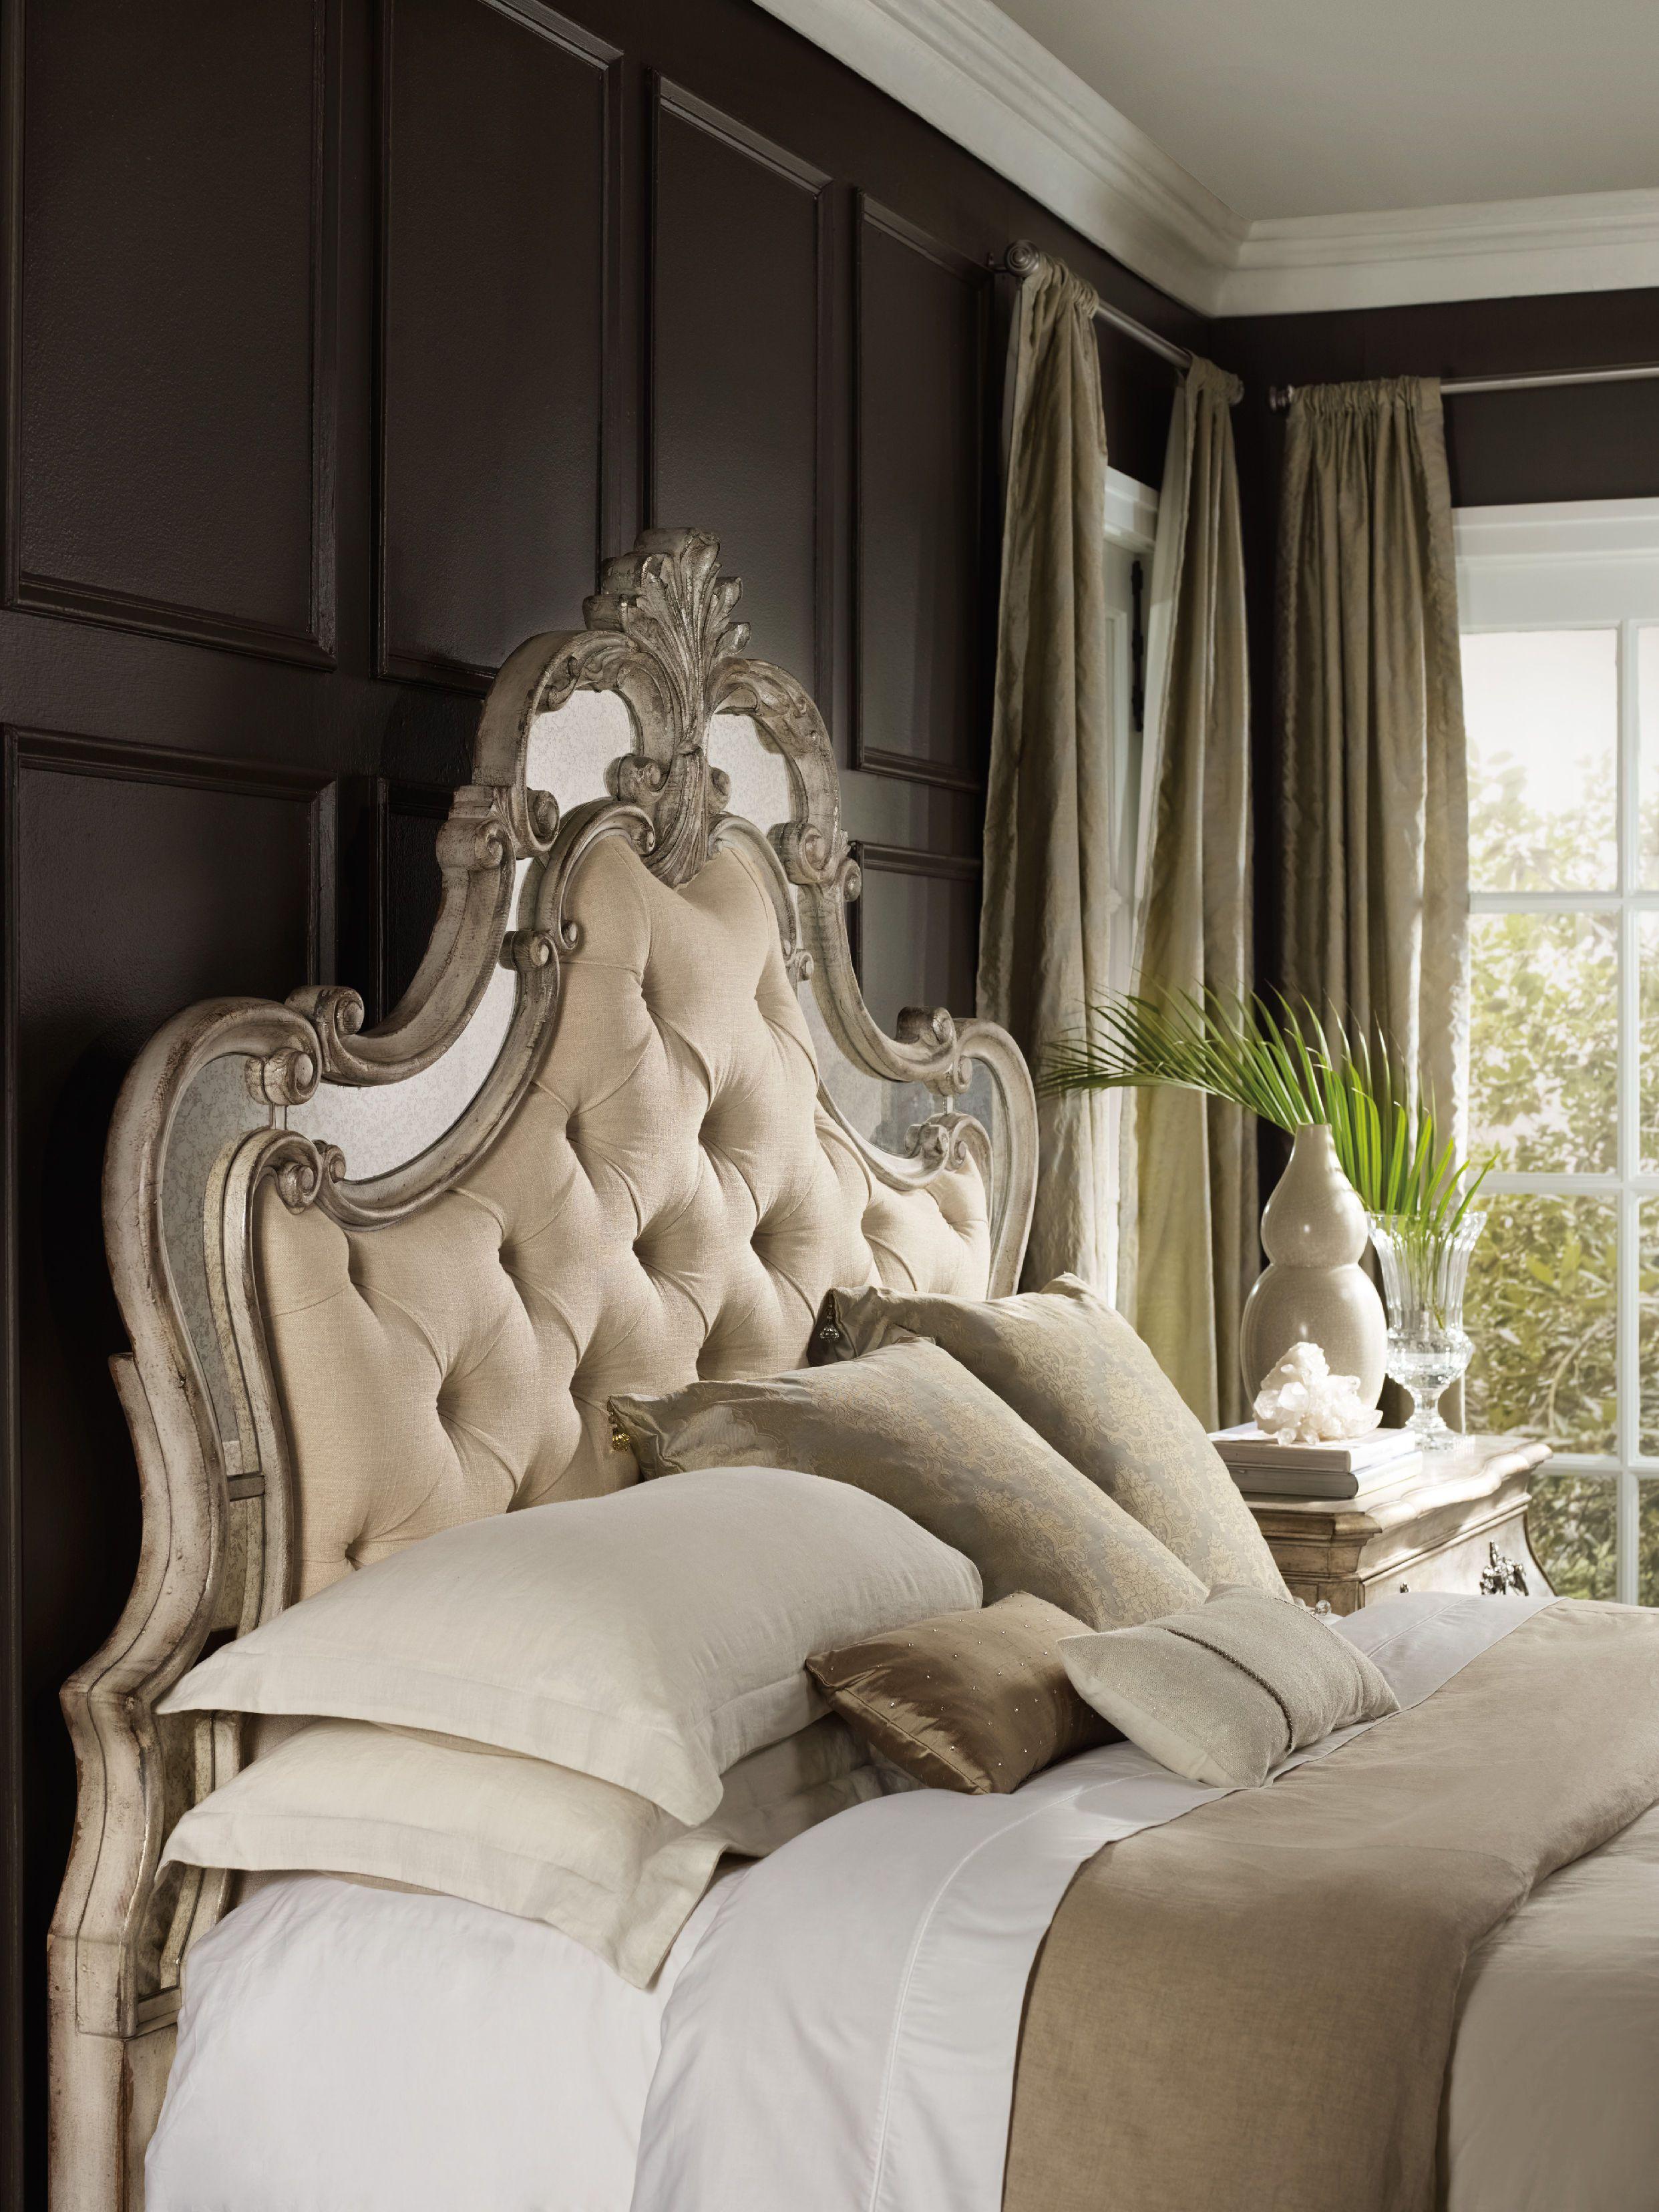 Bedroom Furniture Knoxville furniture in knoxville - bedroom furniture - glamour - master